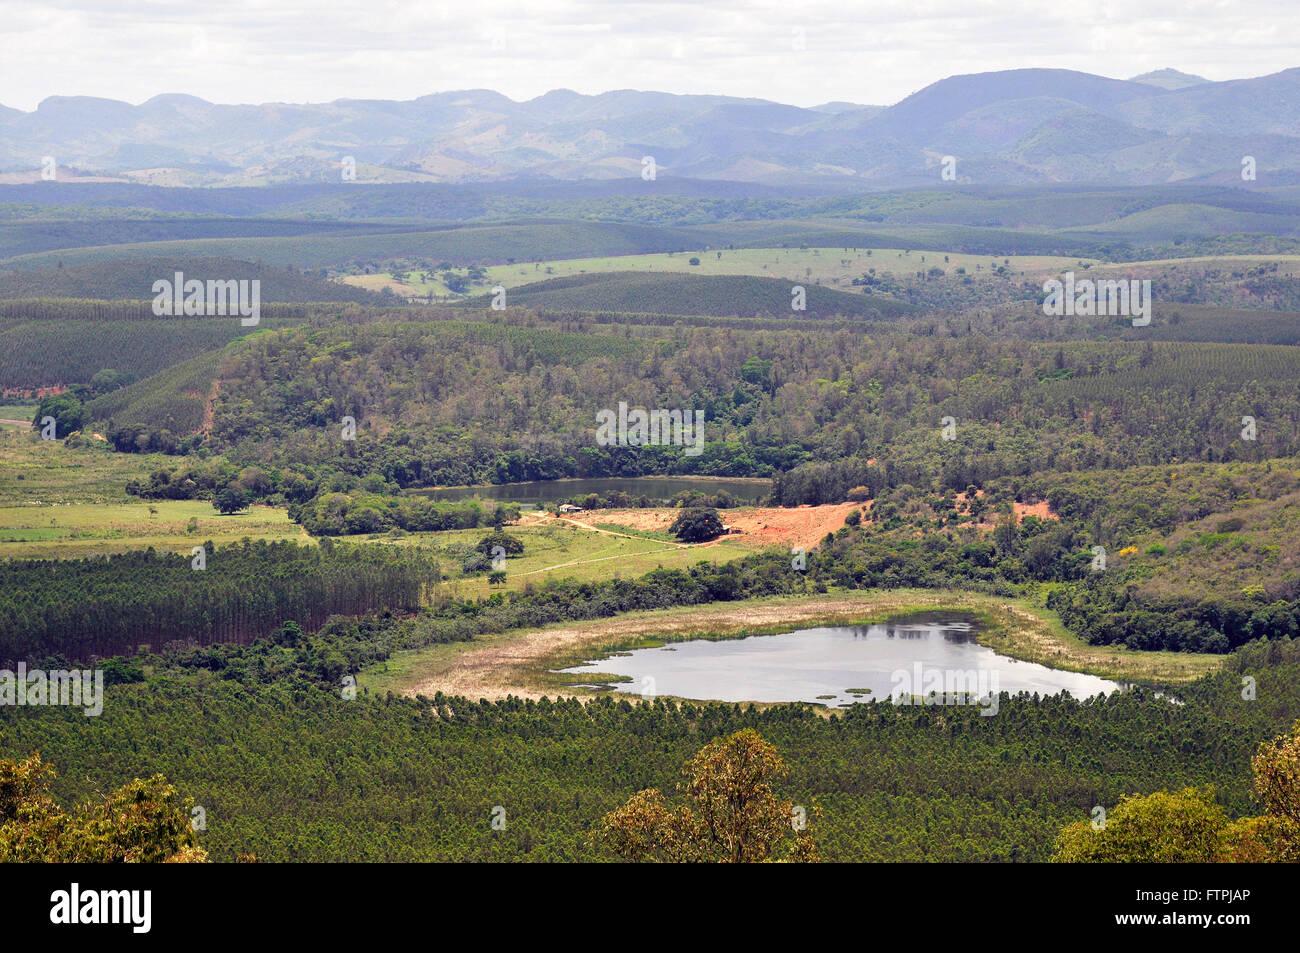 Plantation of eucalyptus trees surrounding the Rio Doce State Park - Stock Image